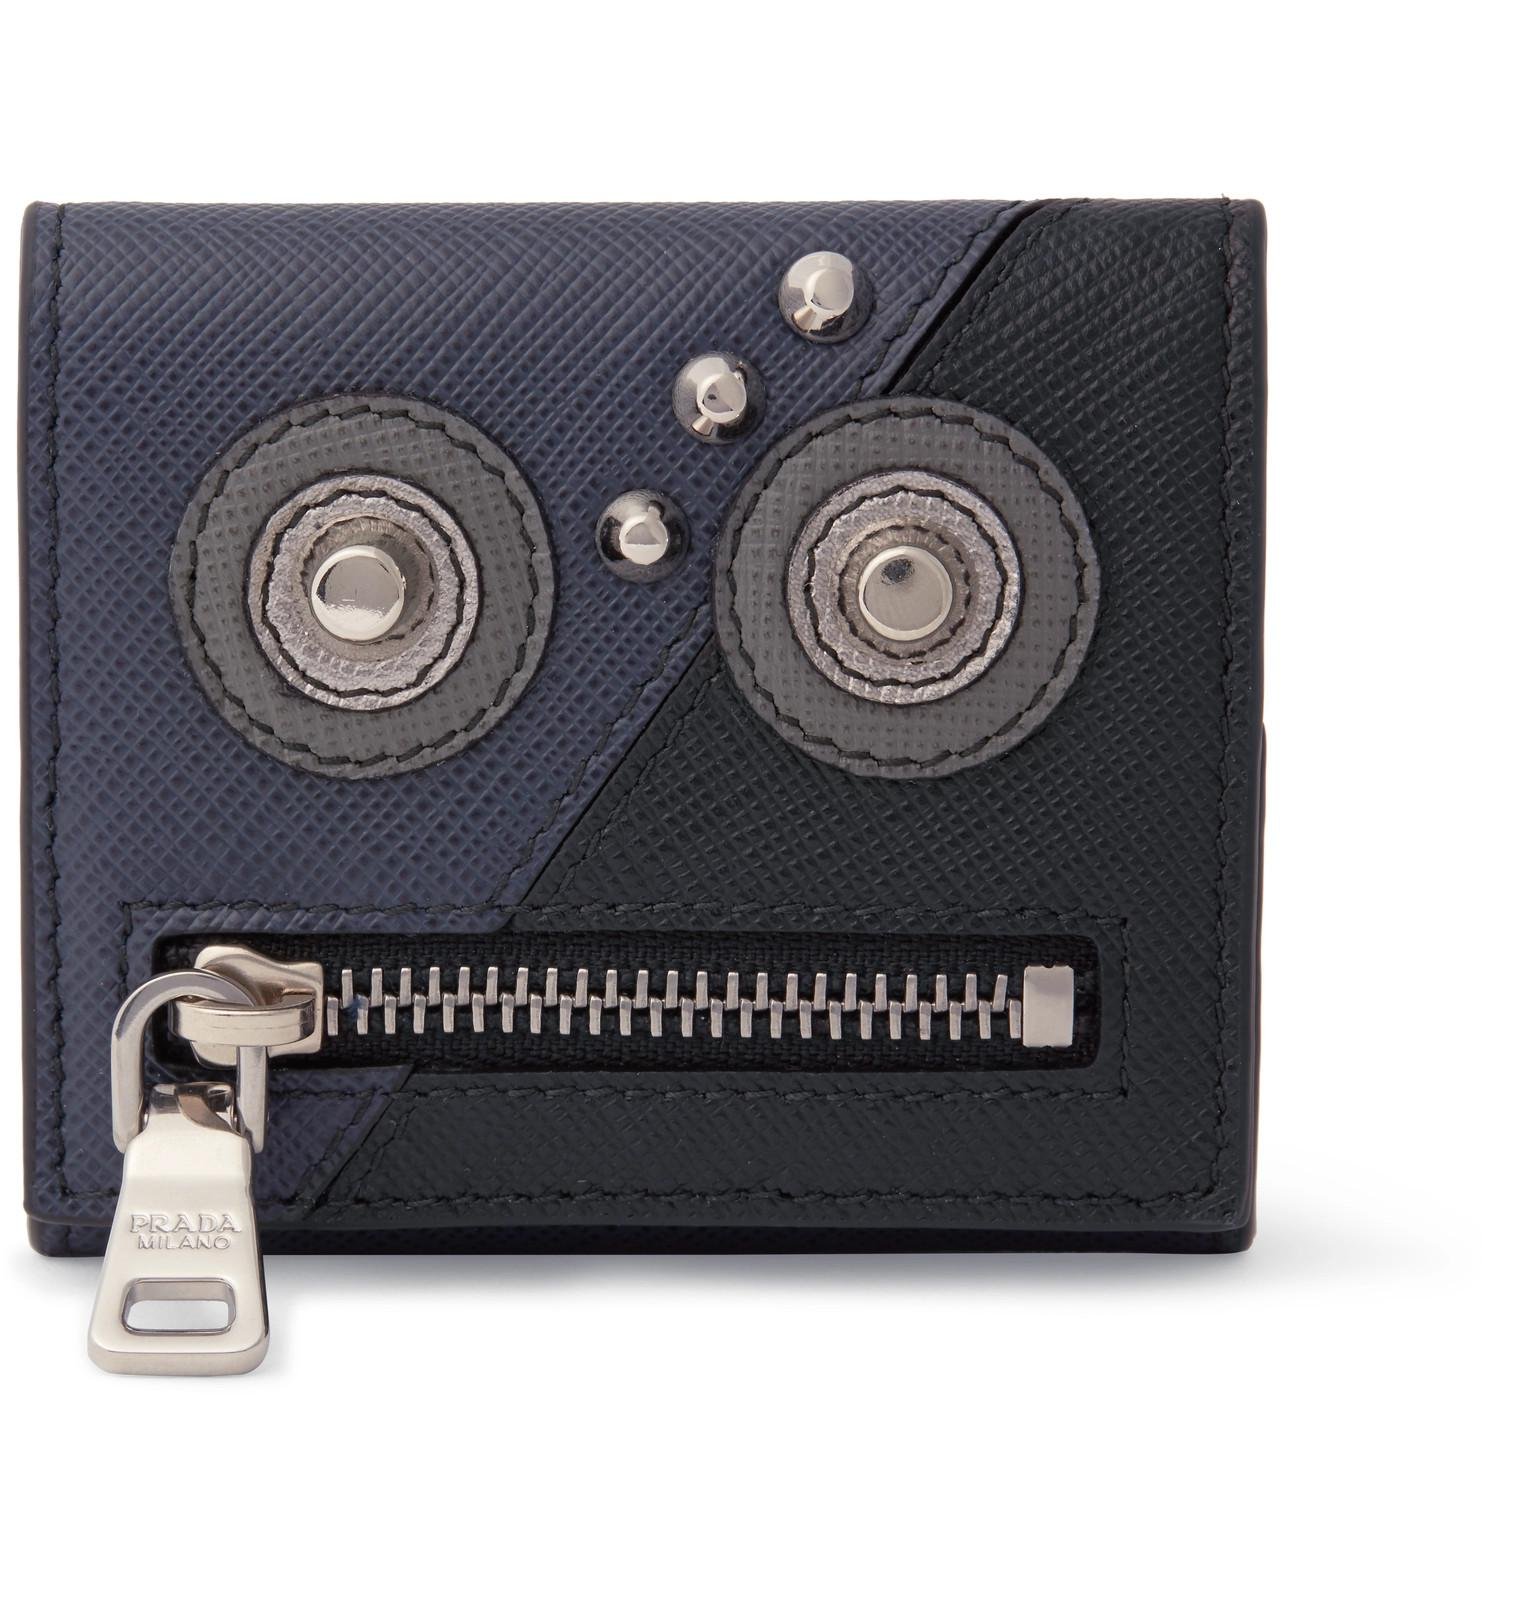 cca860cf628c Prada Robot Saffiano Leather Coin Case in Black for Men - Lyst